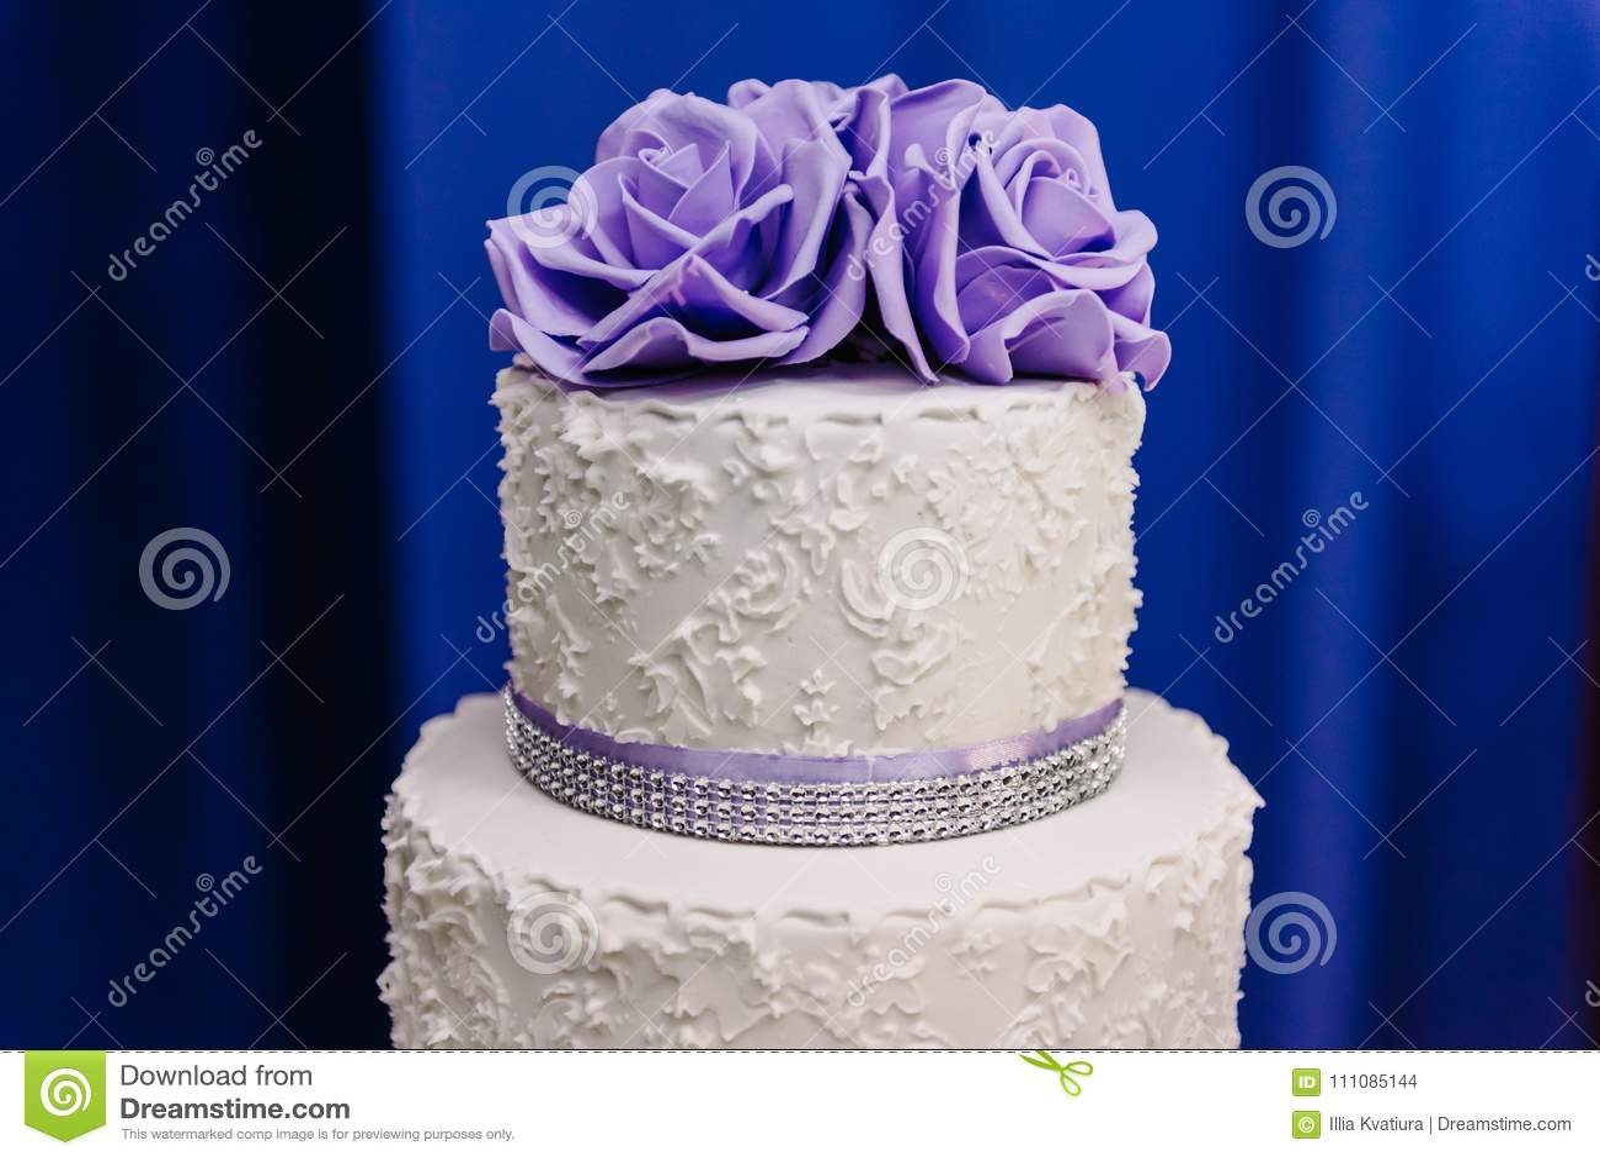 Wedding Cake With Purple Flowers Wedding Cake Stock Photo Image